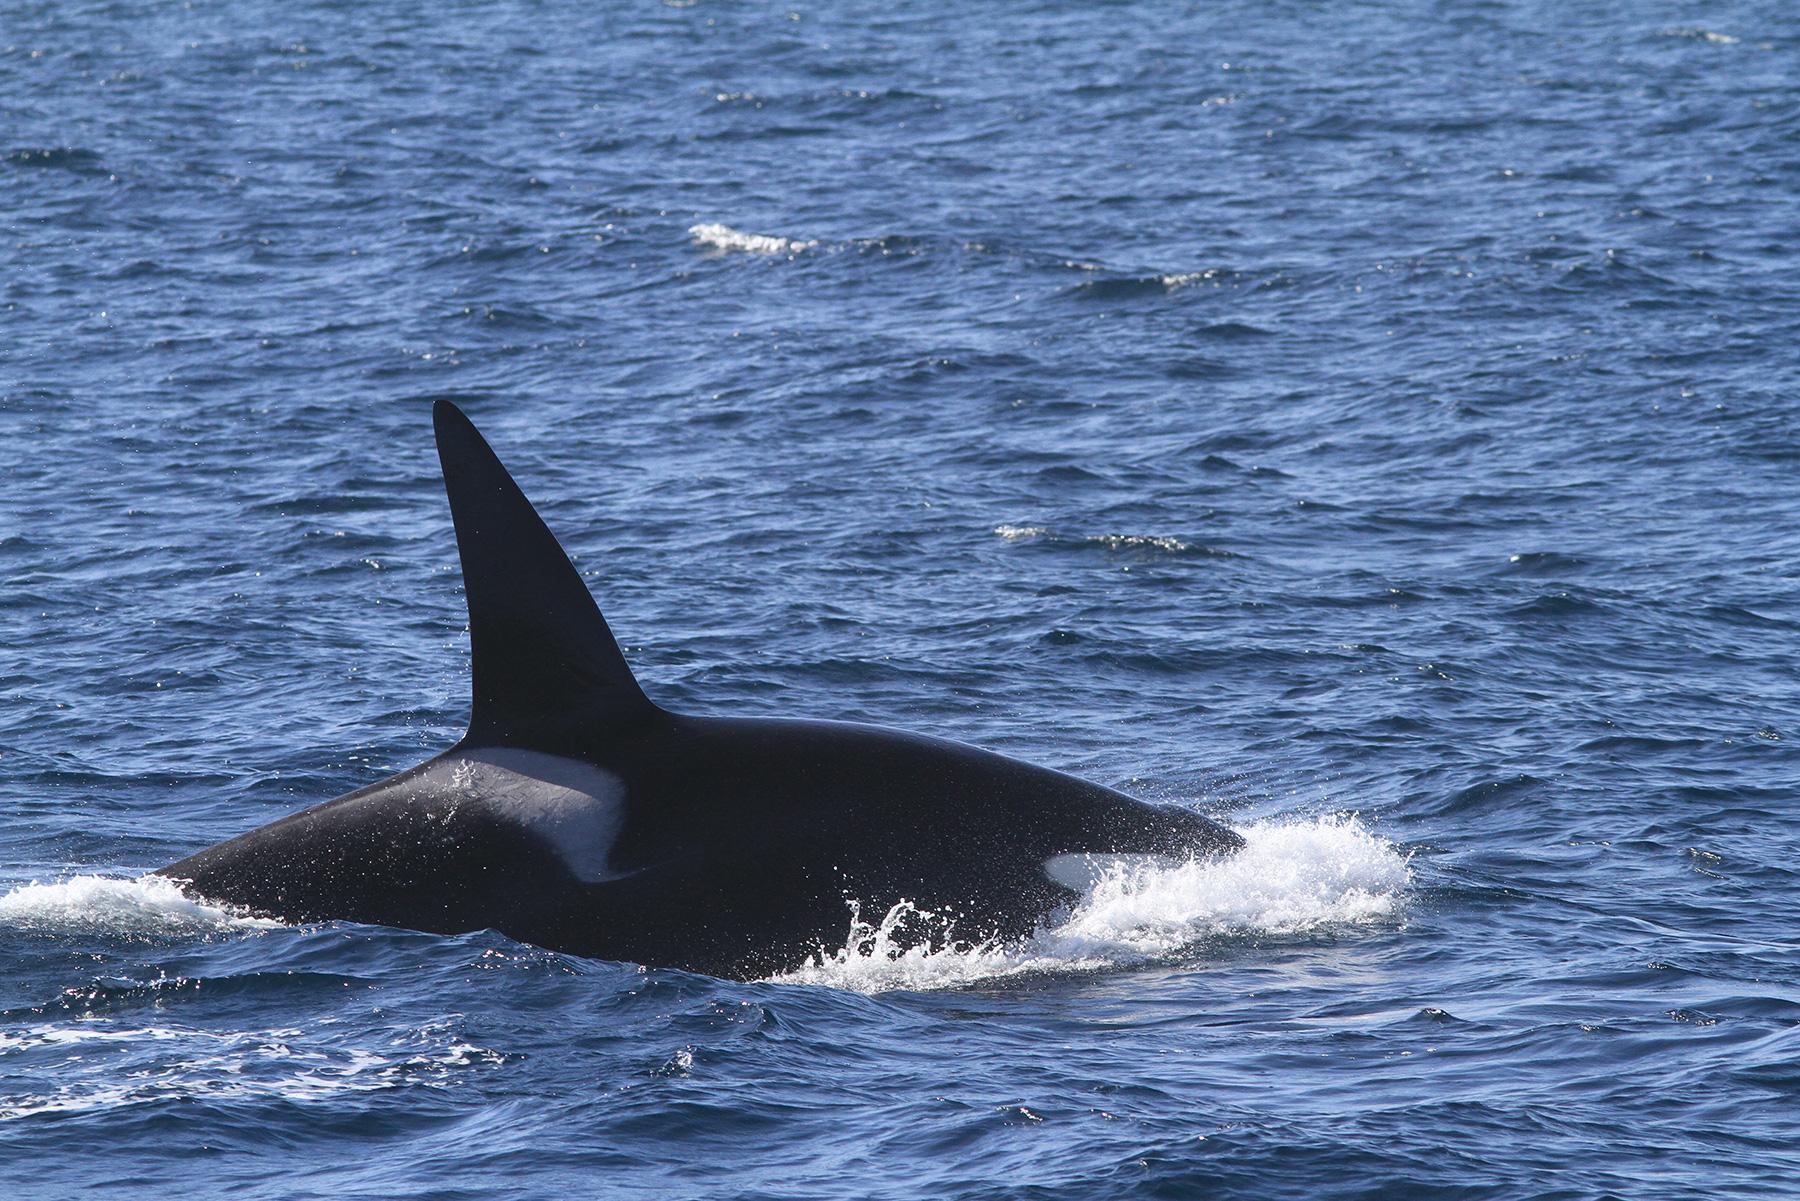 killer whales feast in santa barbara channel